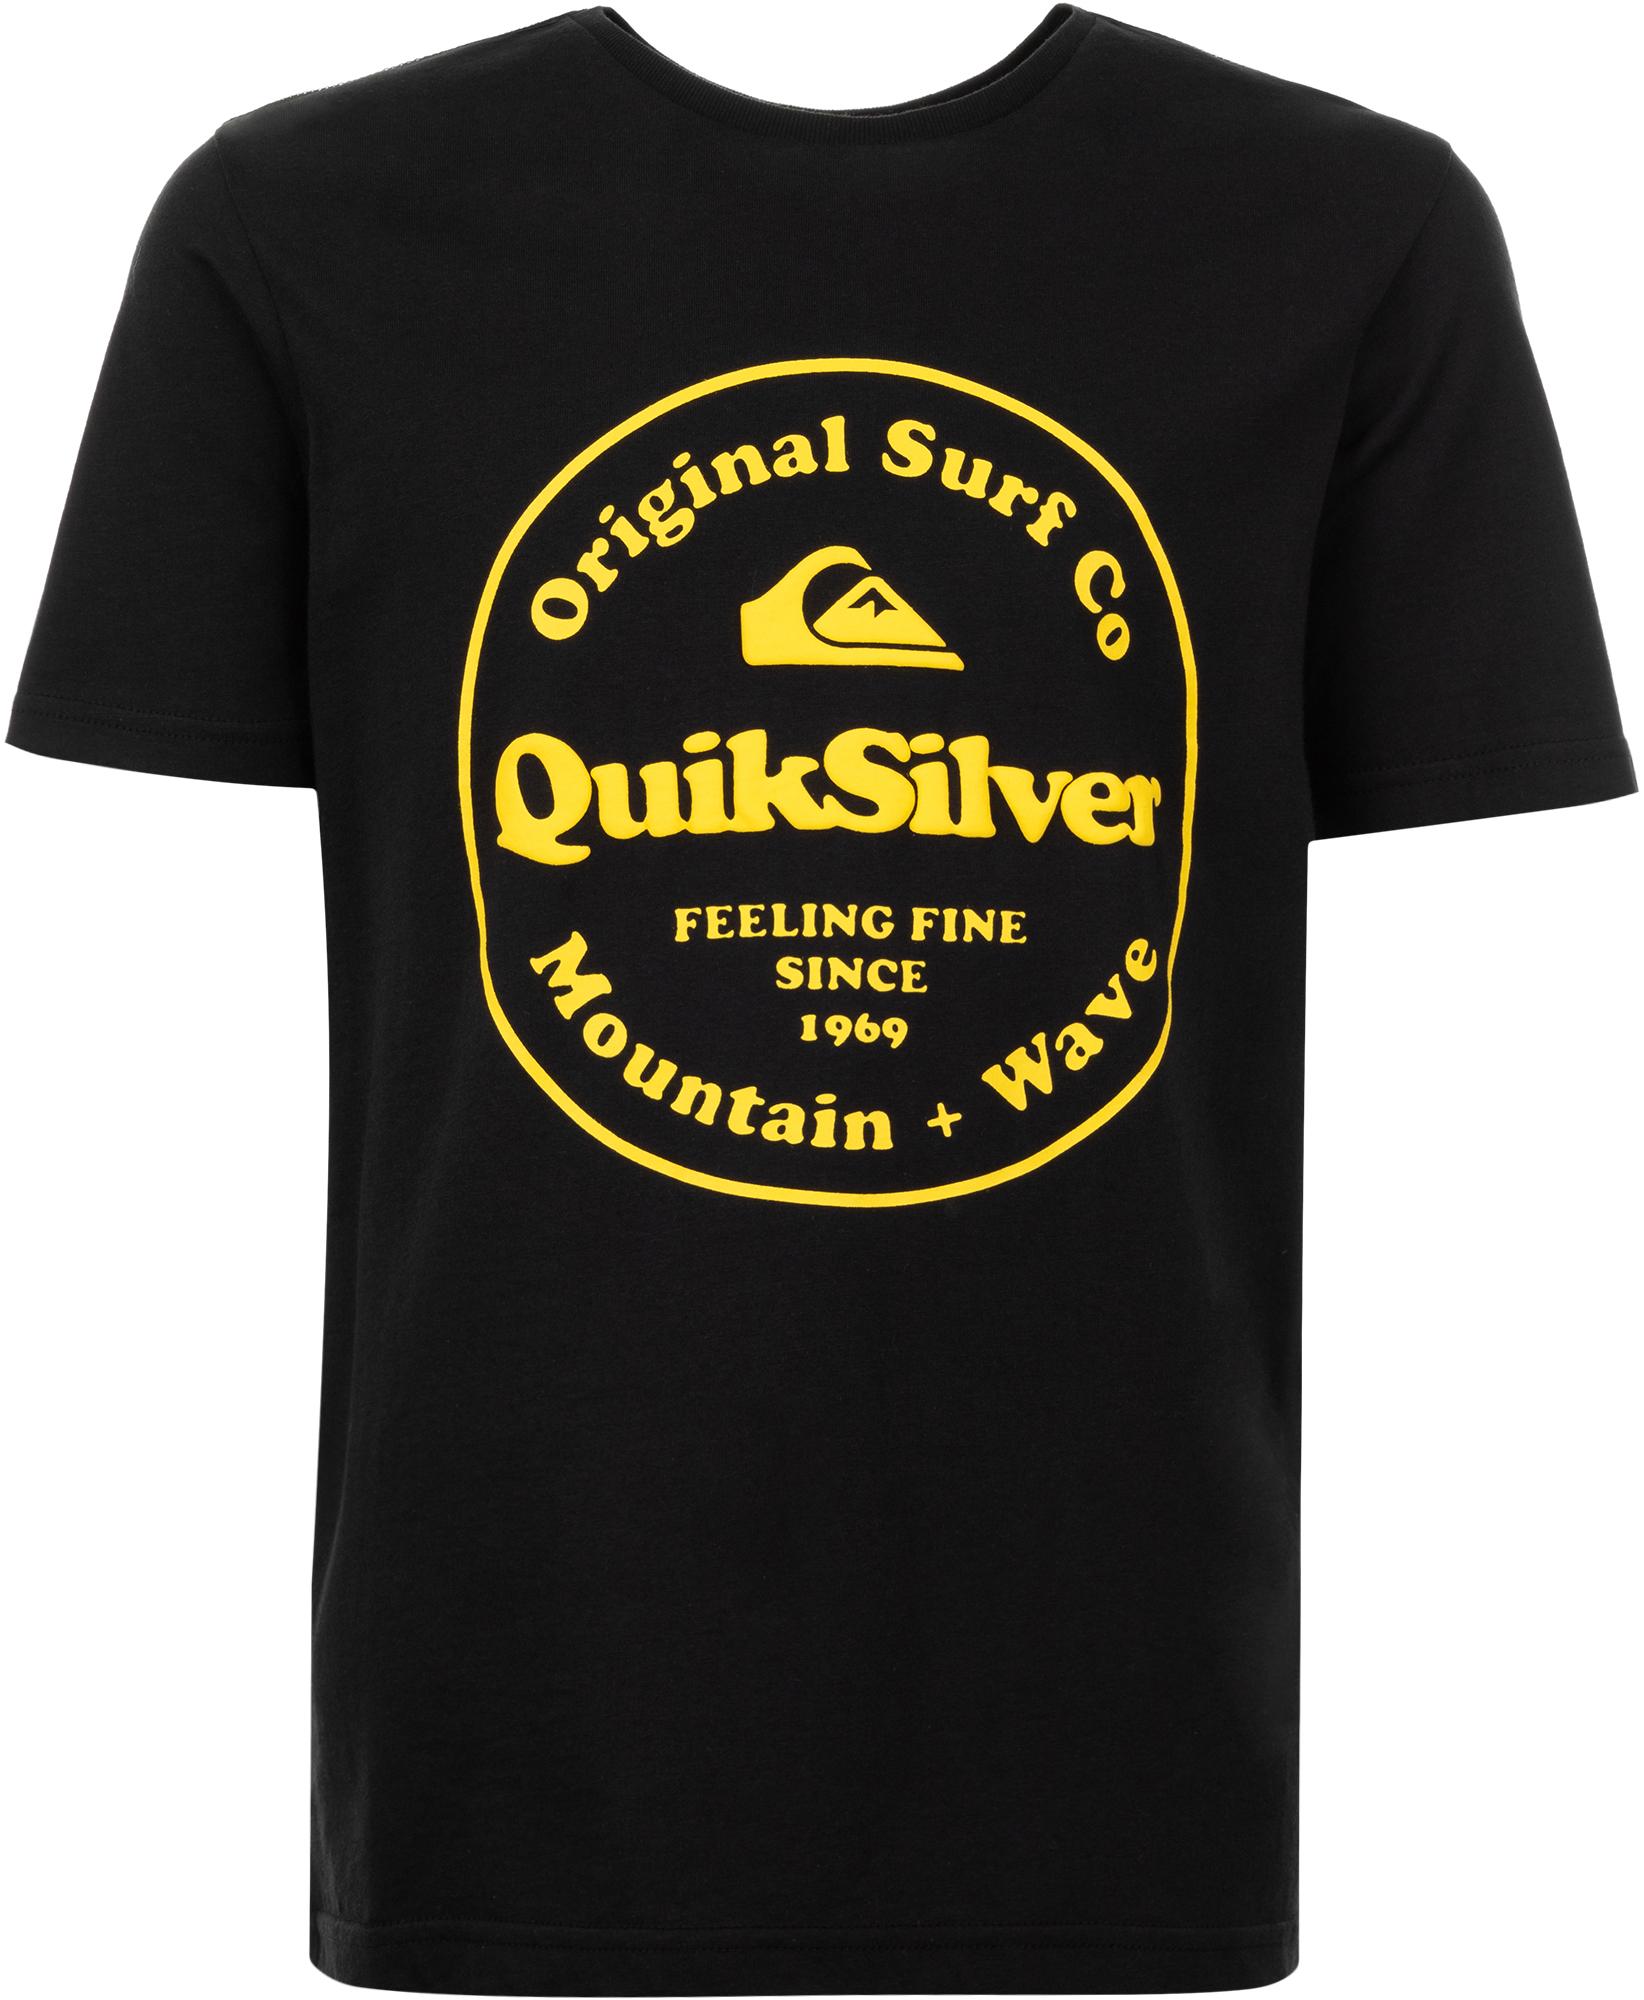 цены Quiksilver Футболка для мальчиков Quiksilver Secret Ingredient Ss Youth, размер 164-170